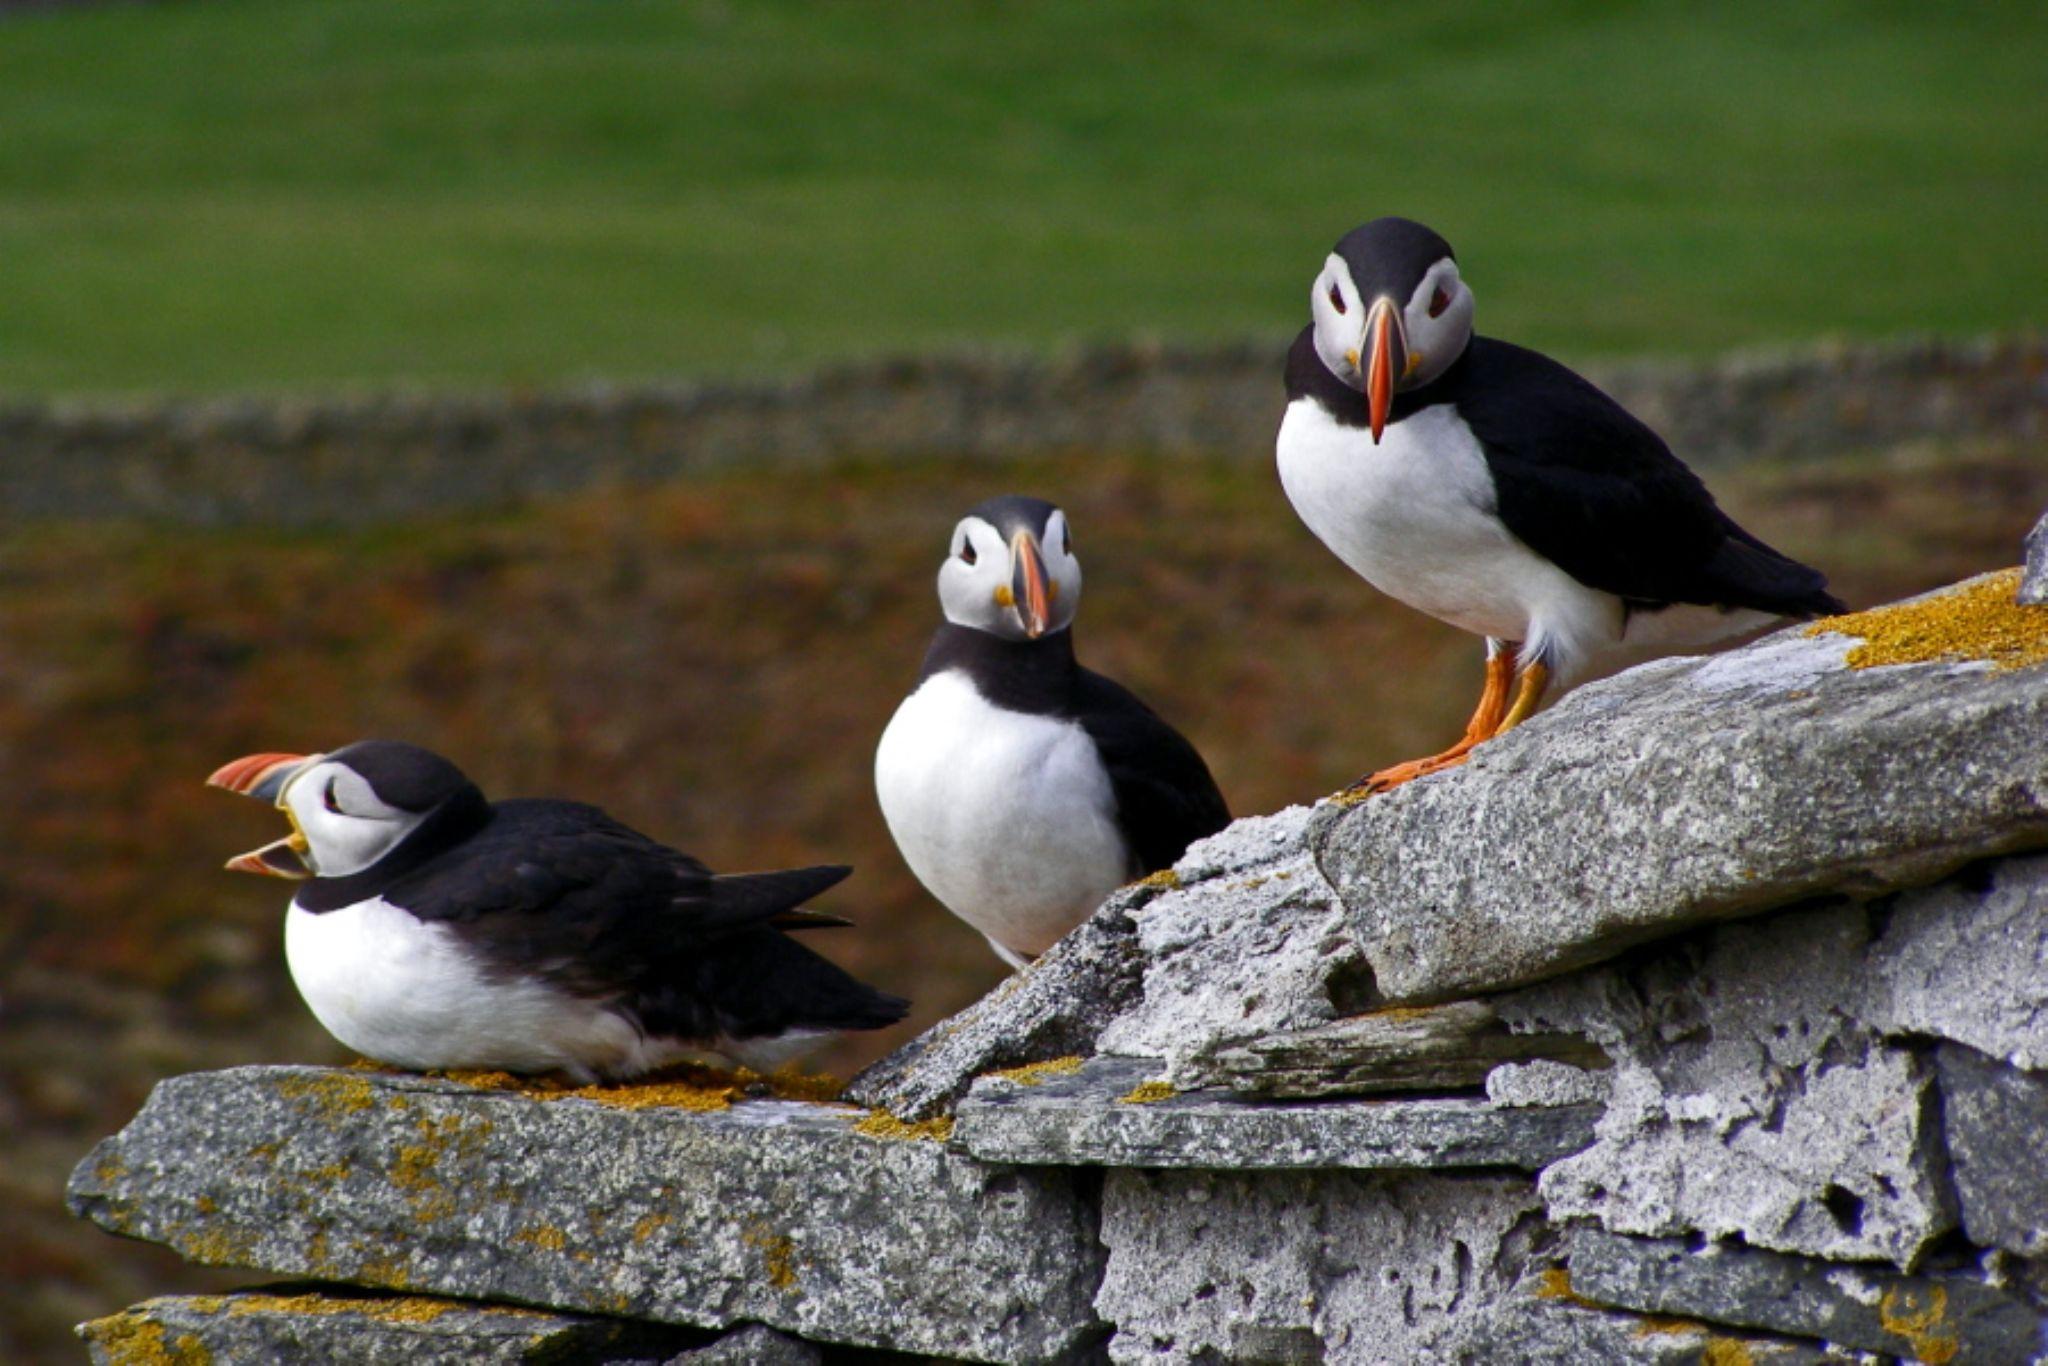 Puffins, Sumburgh, Shetland Isles by Kate Ali